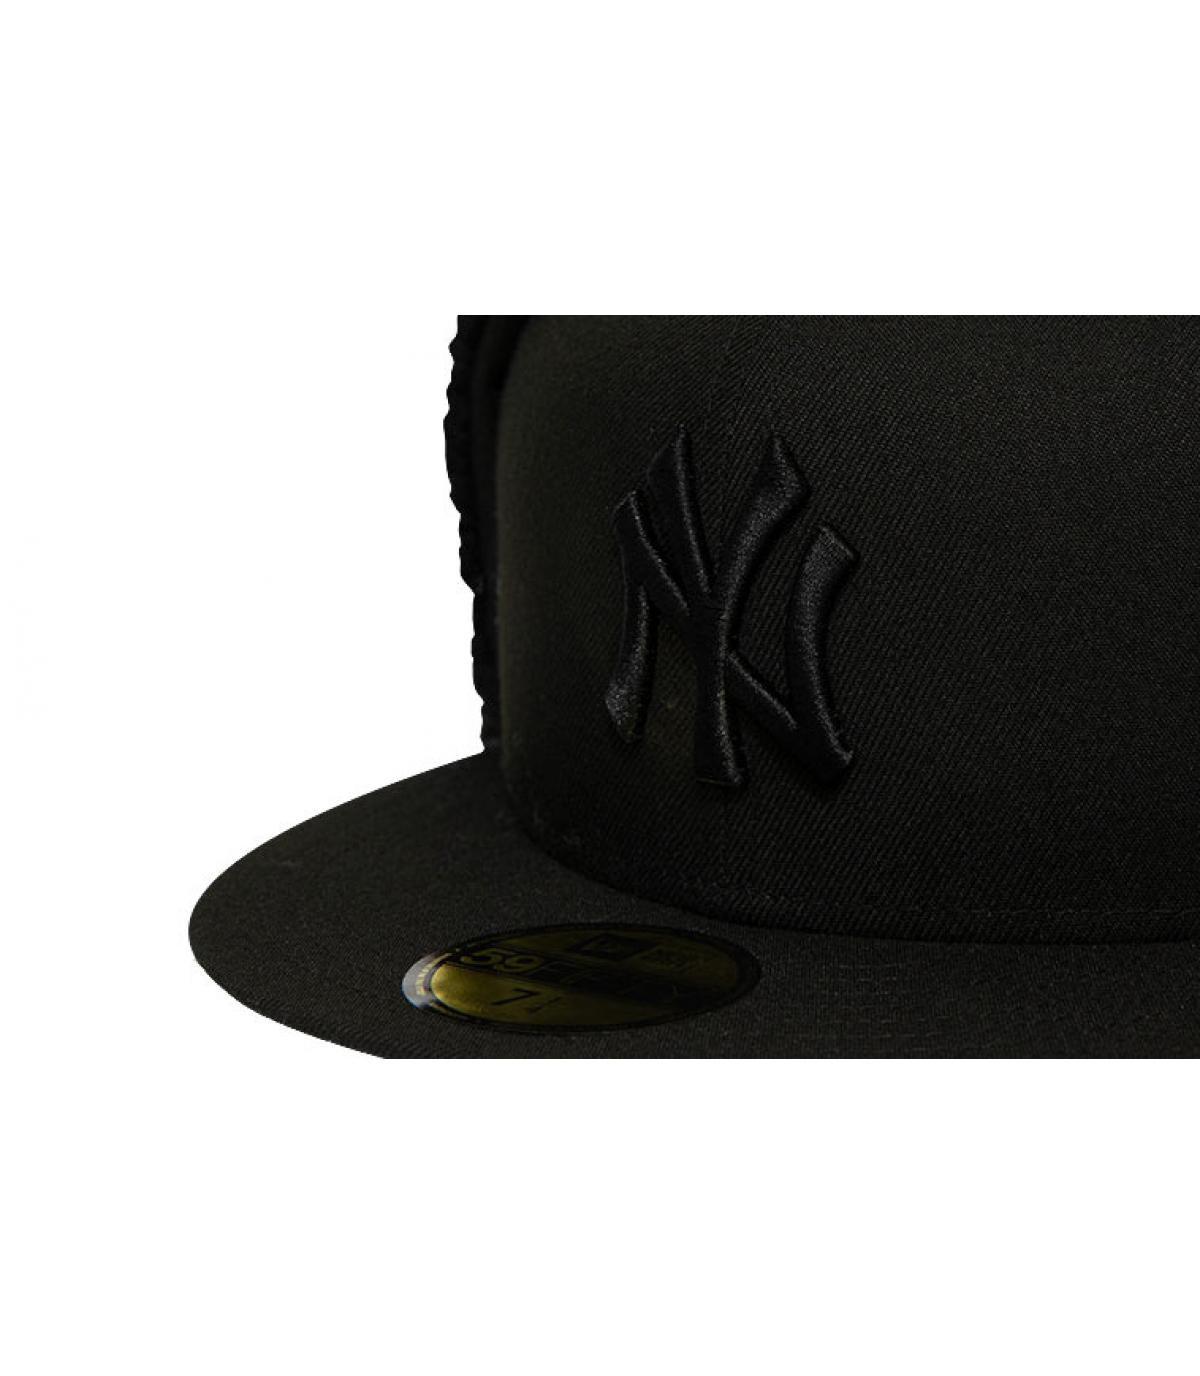 Details Cap League Ess Dogear NY 5950 black black - Abbildung 3